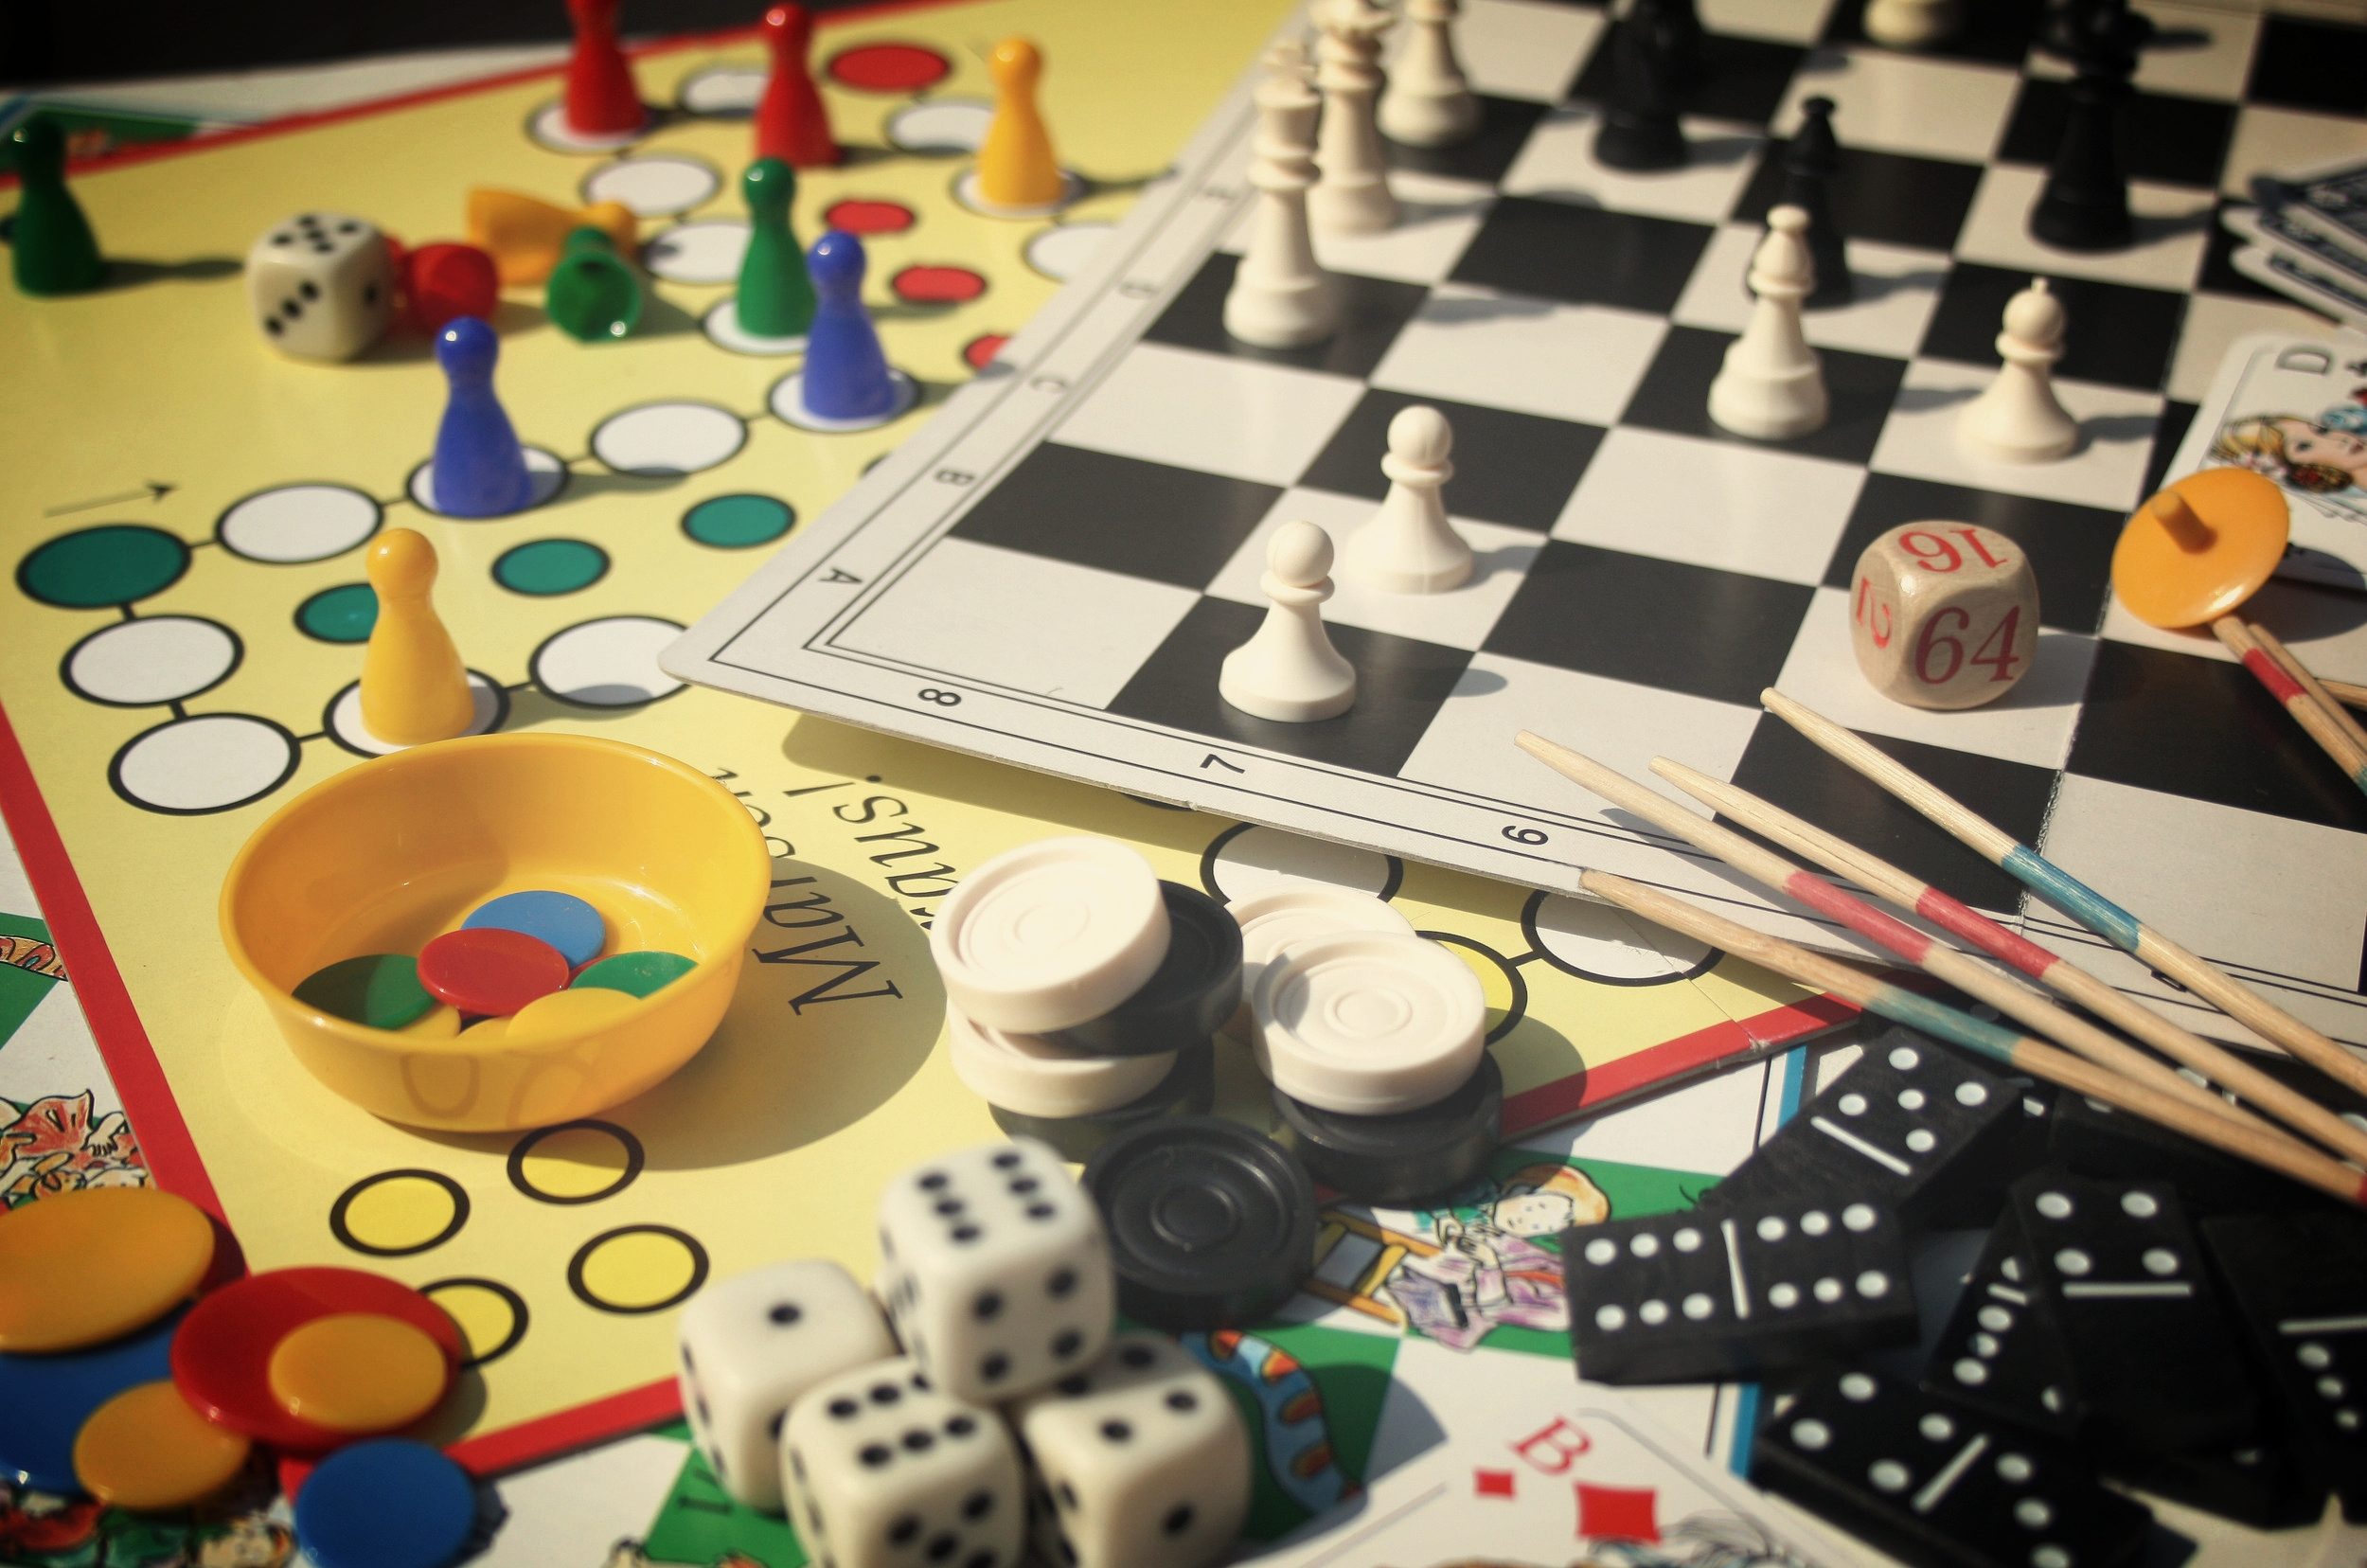 636114590217688682-941516278_boardgames.jpg